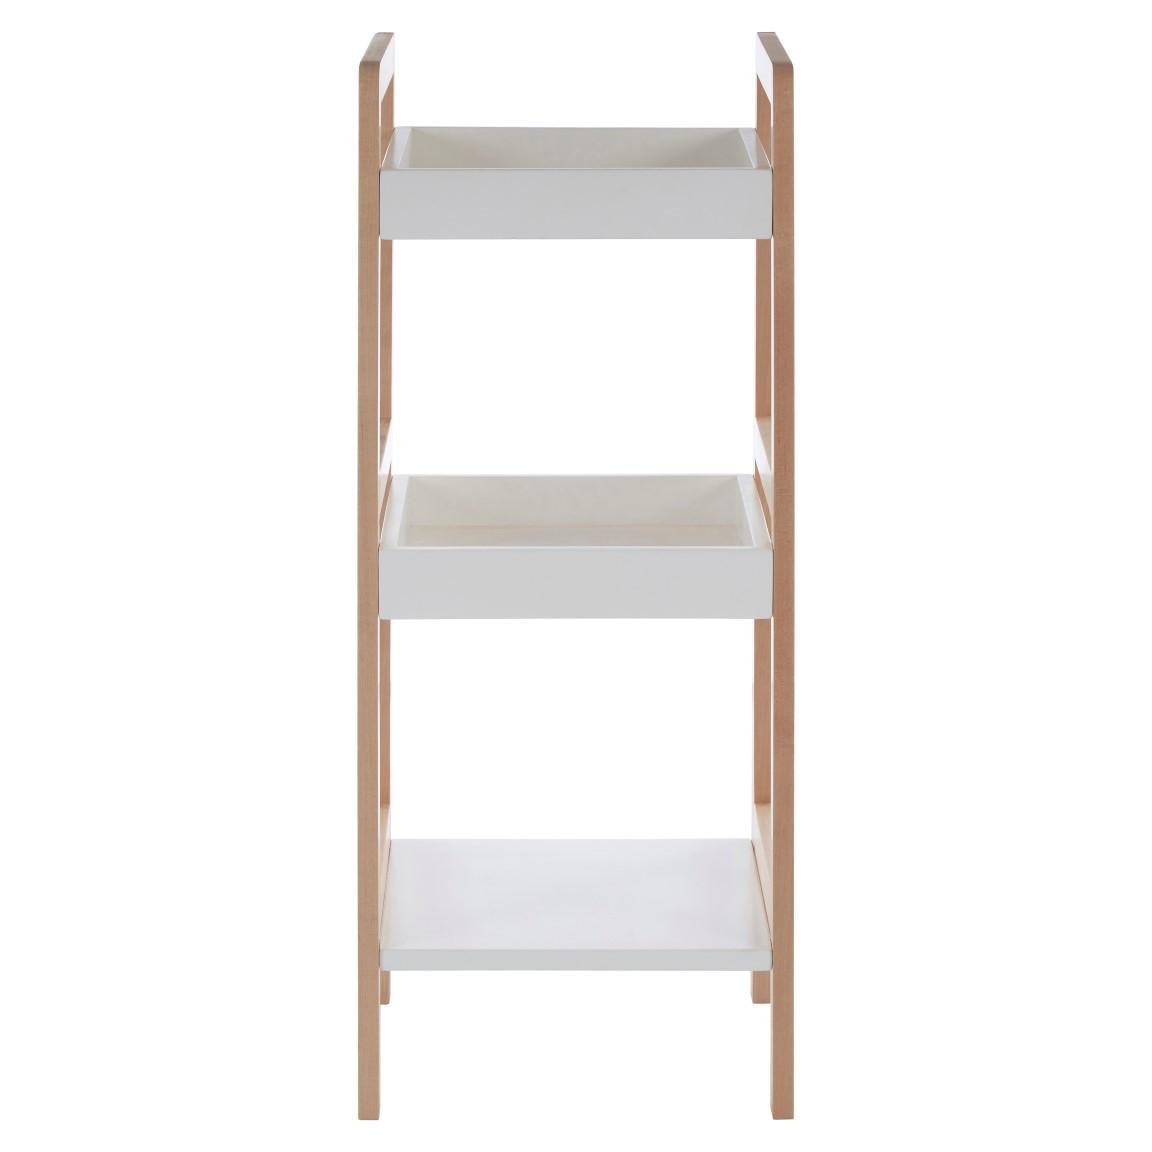 3 Tier Bathroom Shelf Birch Wood + MDF | White